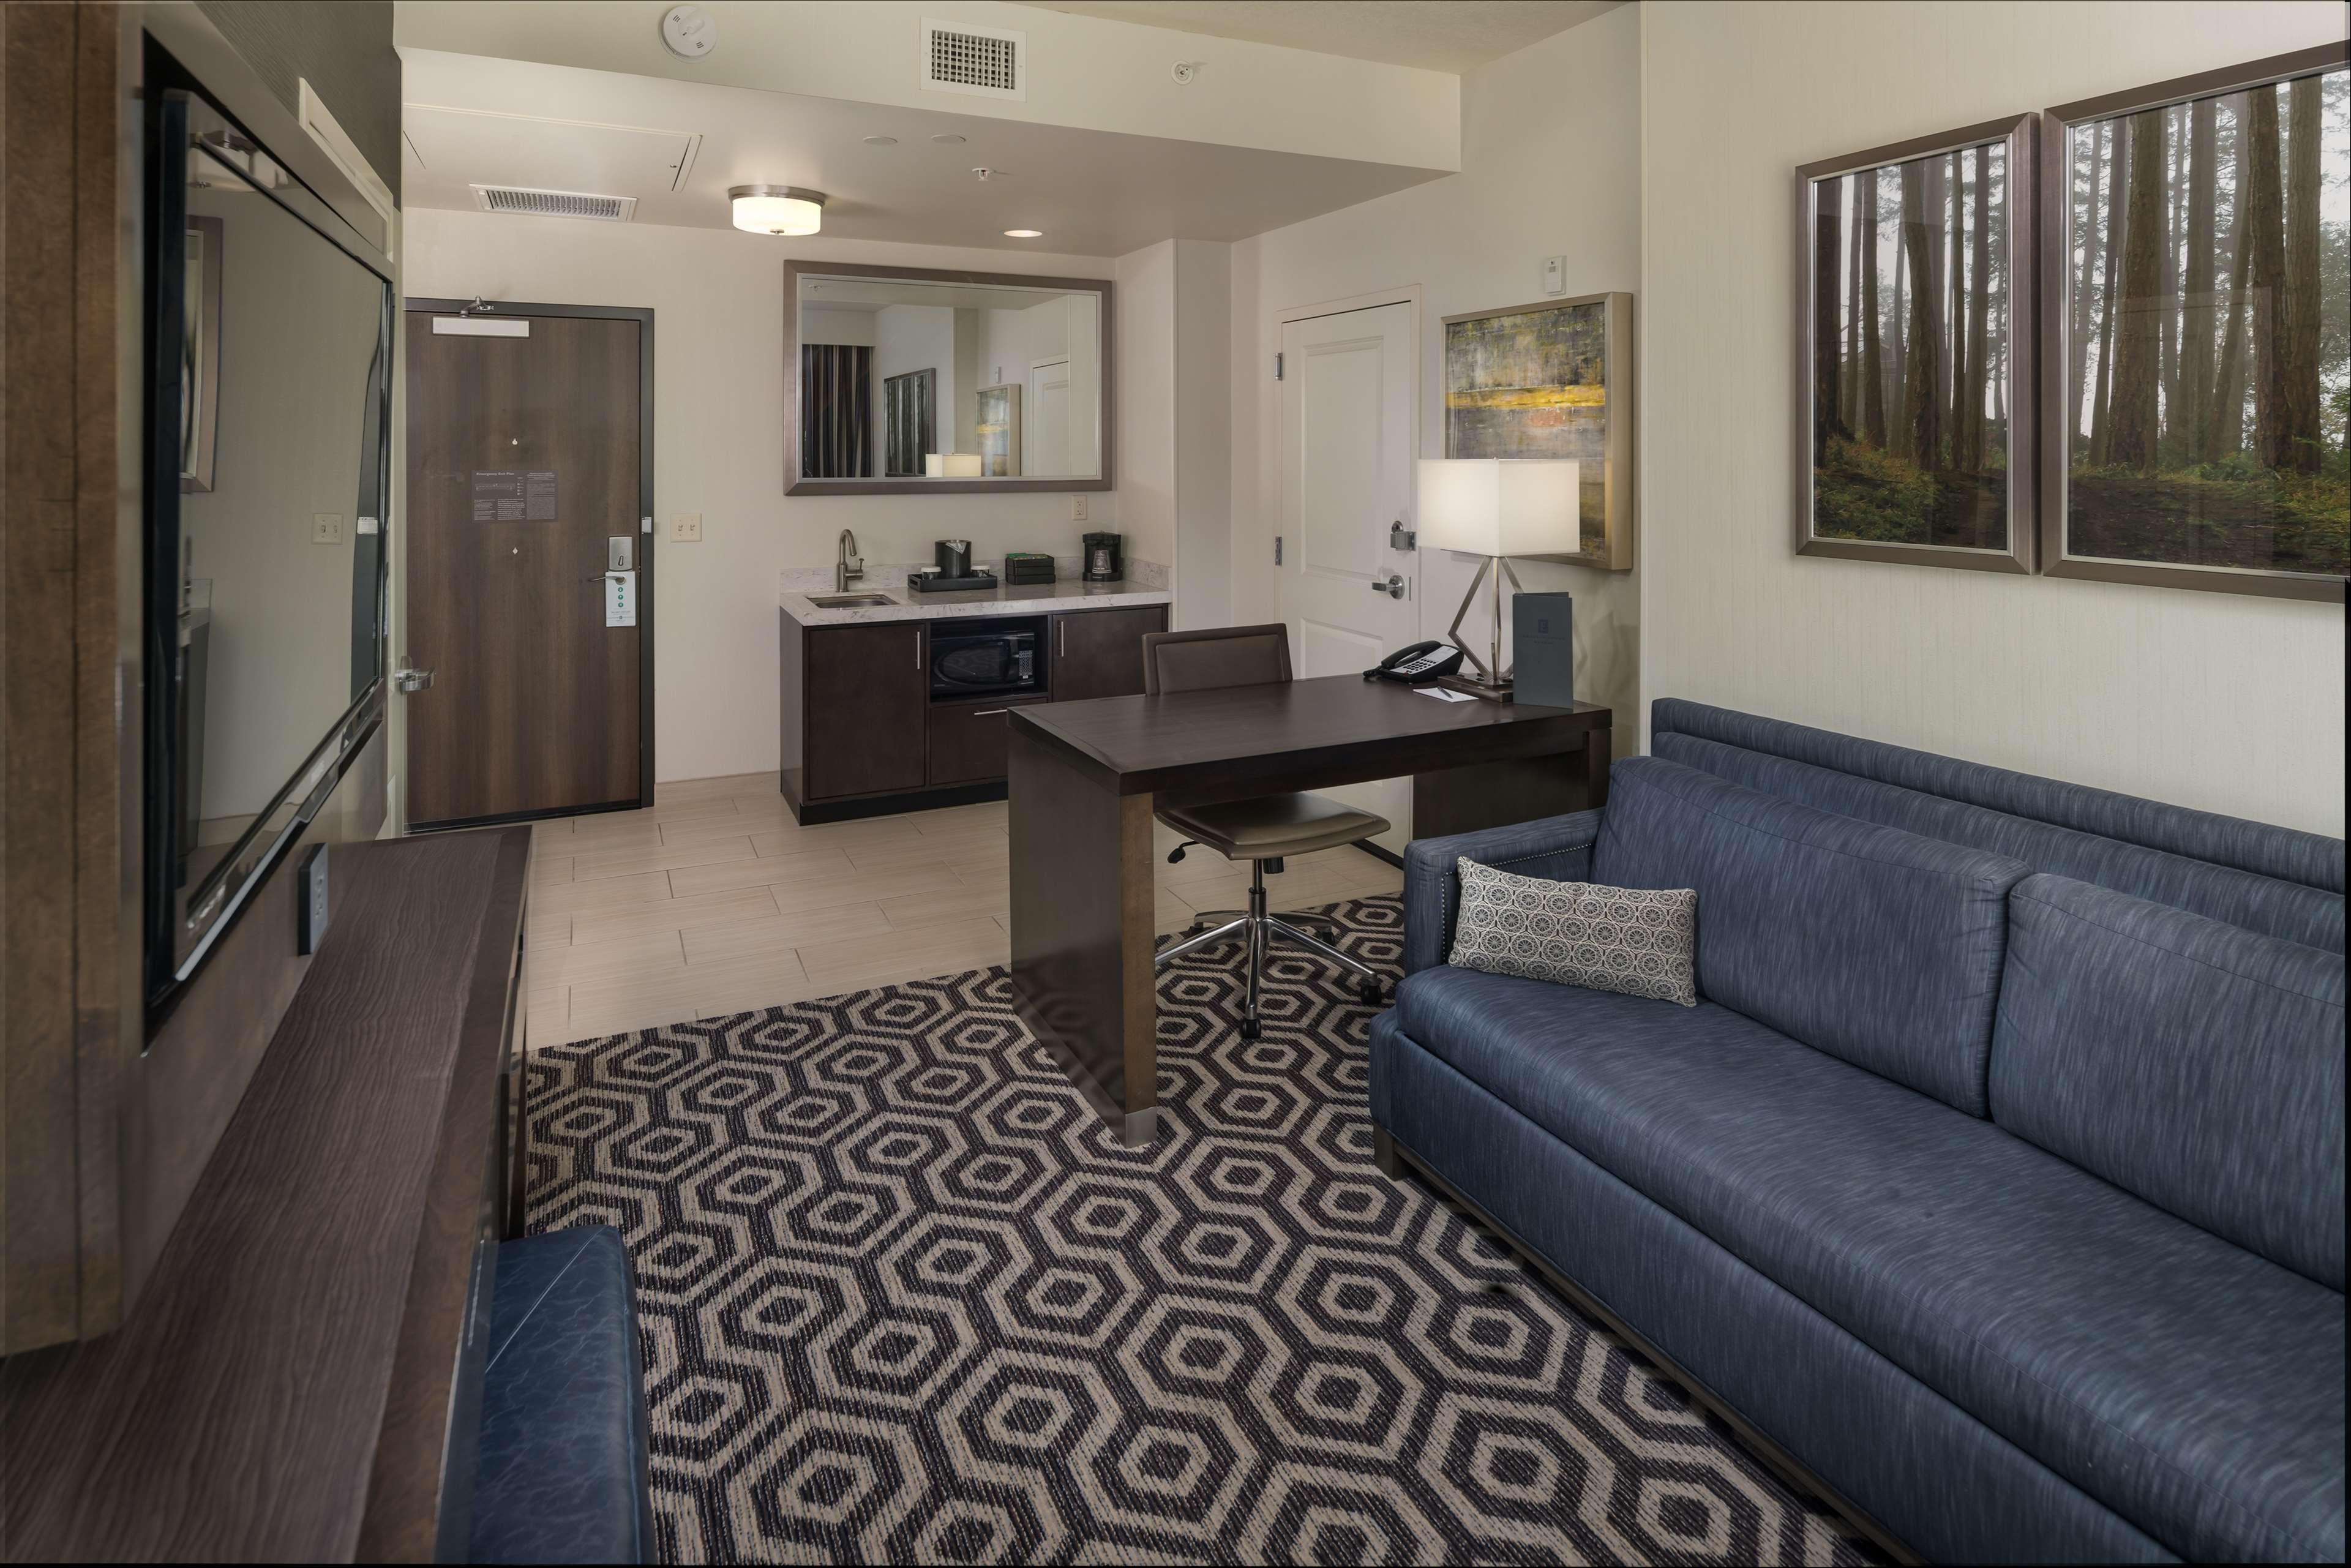 Embassy Suites by Hilton Portland Hillsboro, Oregon image 20